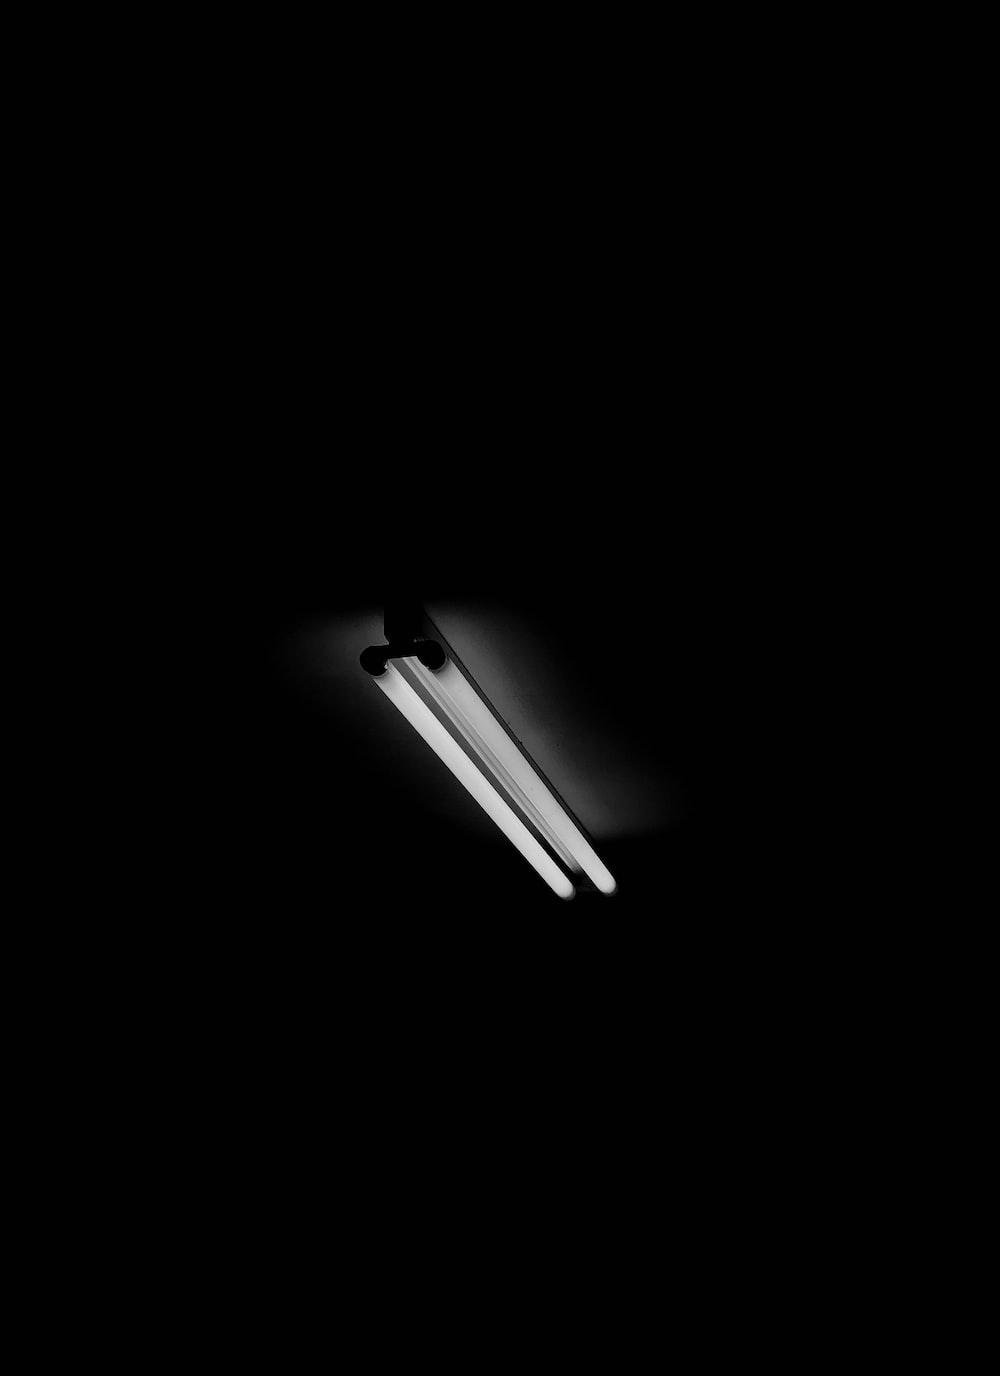 white and black stick illustration